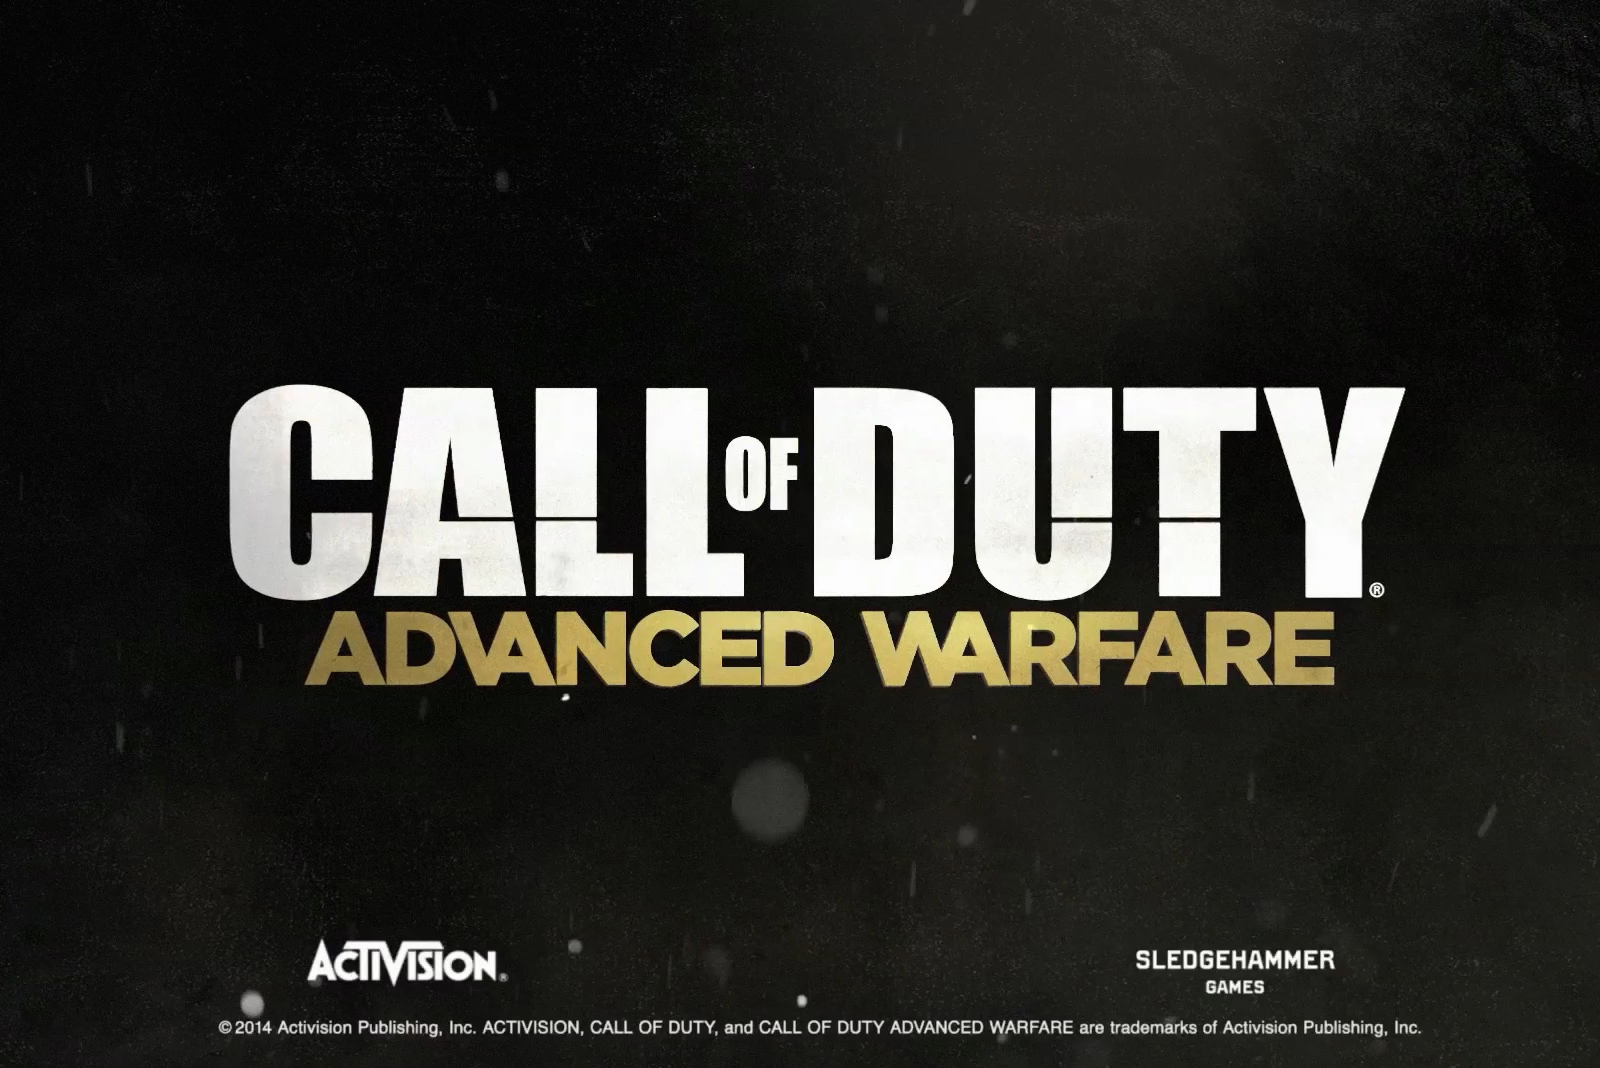 Sledgehammer Call of Duty Leaked Early – Titled Advanced Warfare